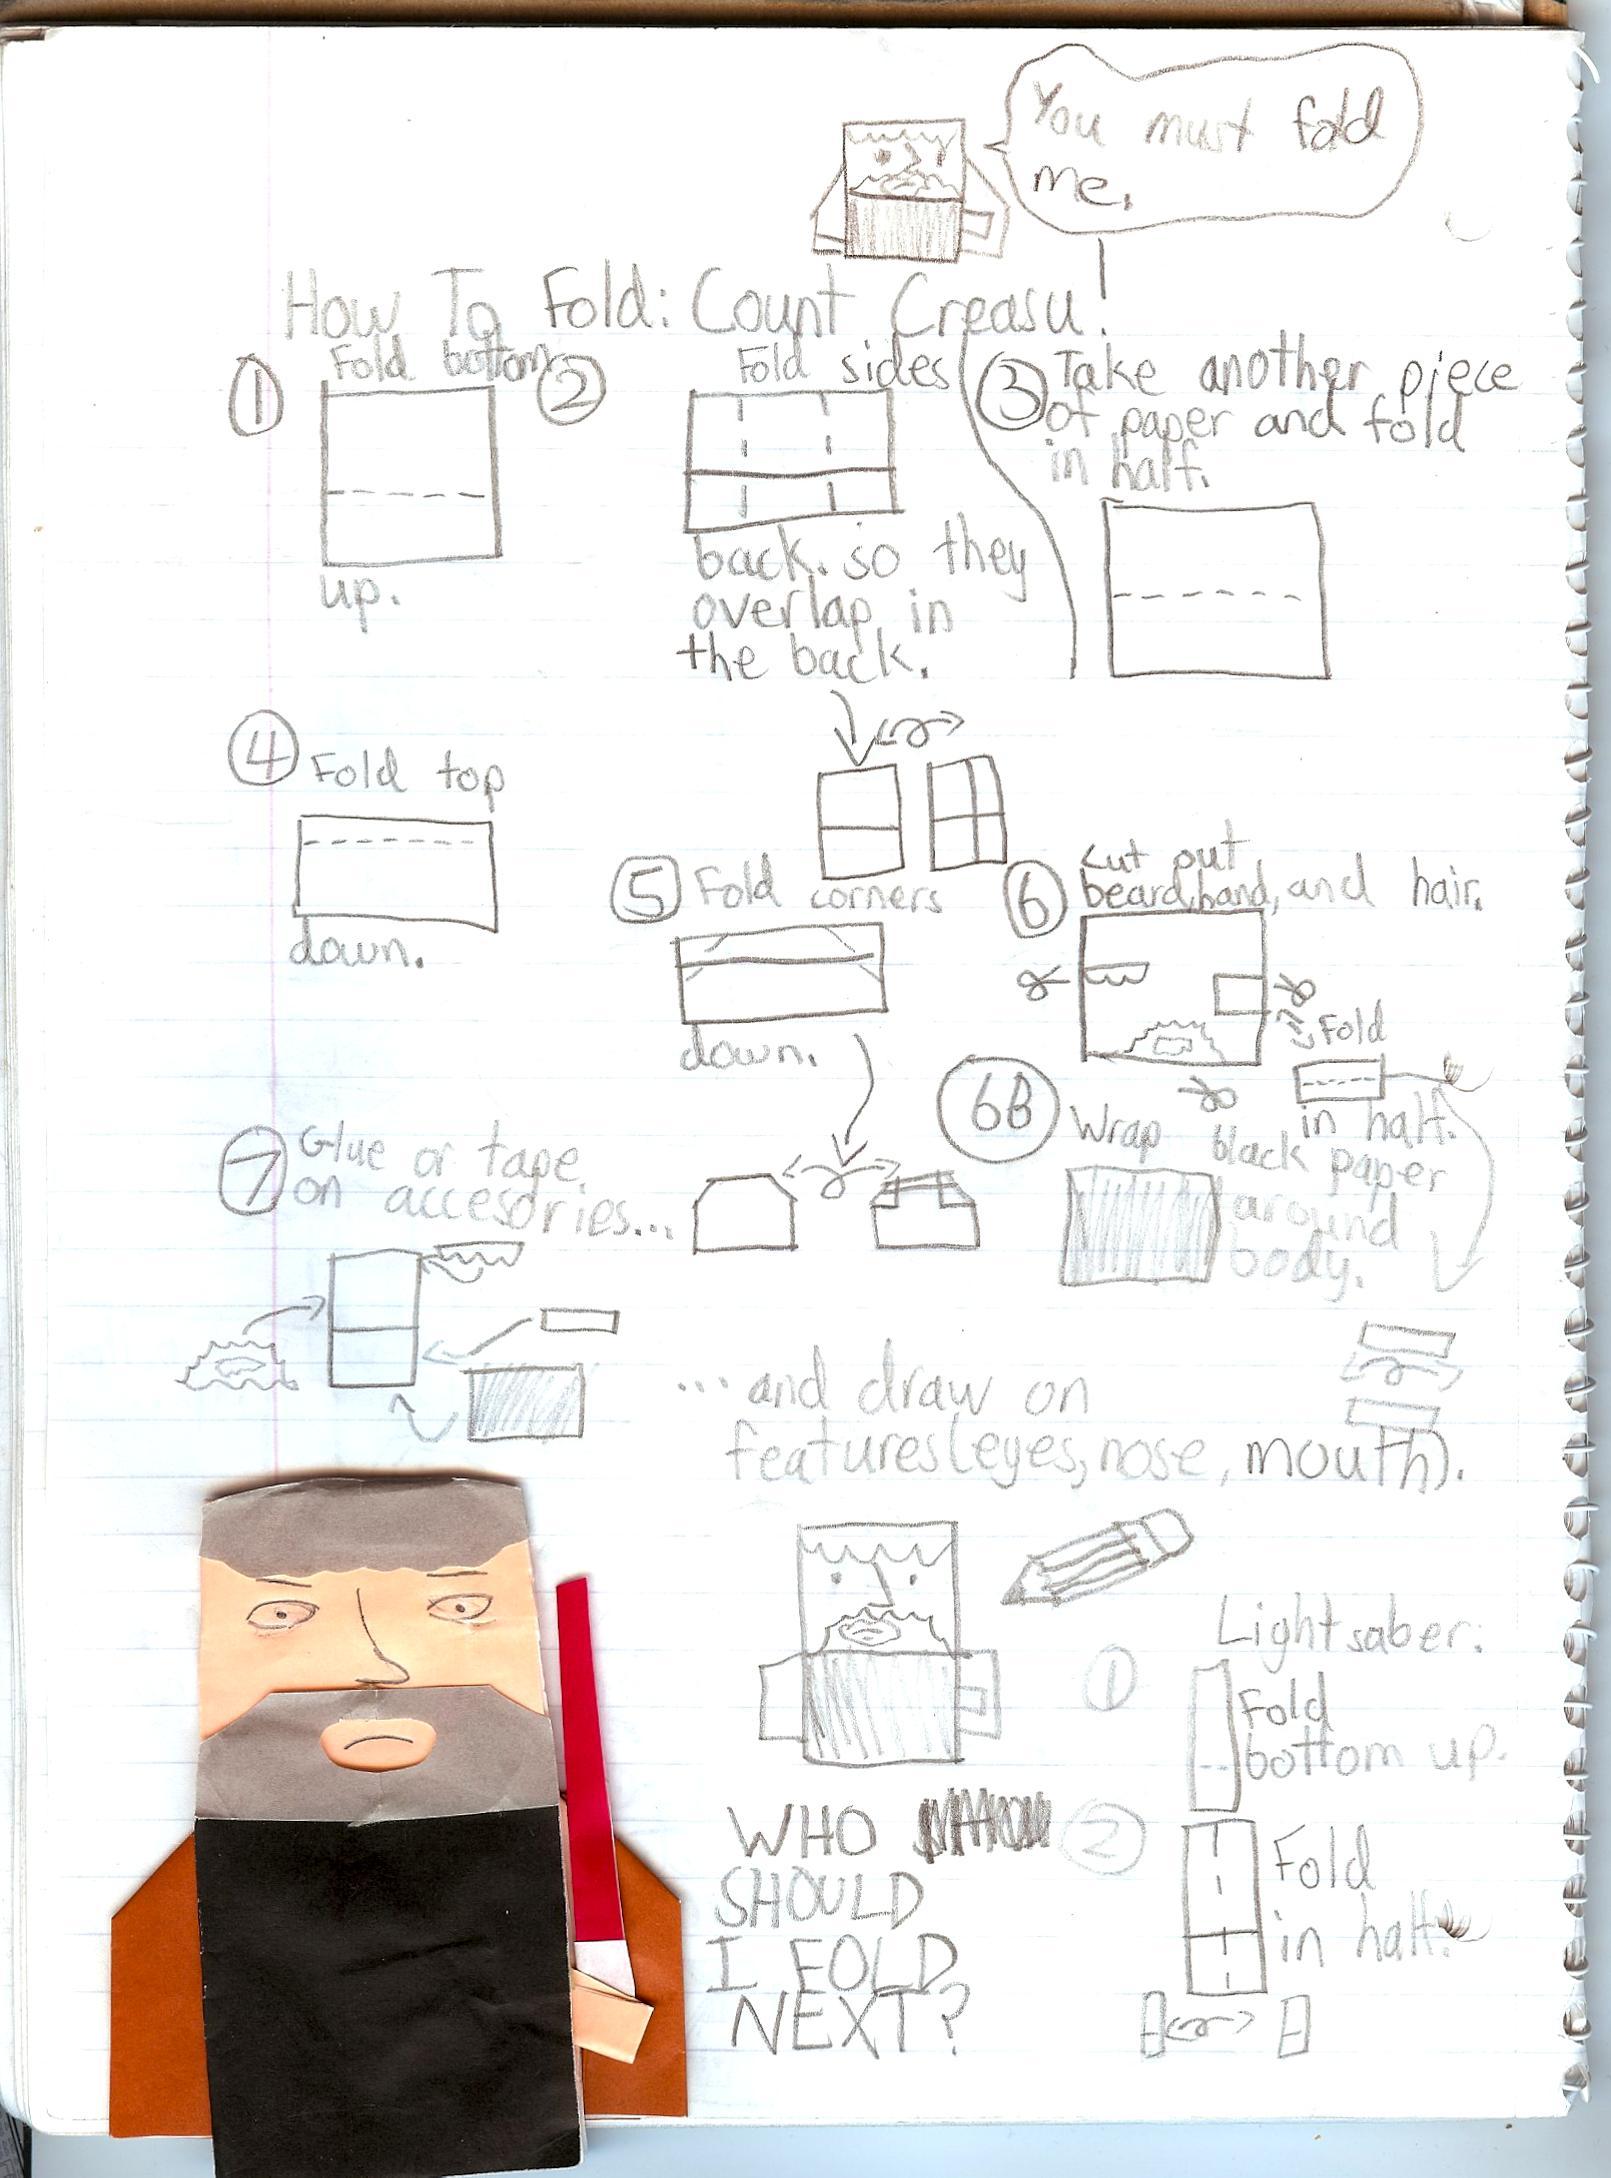 Tom Angleberger's Blog - SuperFolder CocoaBean's Count ... - photo#32